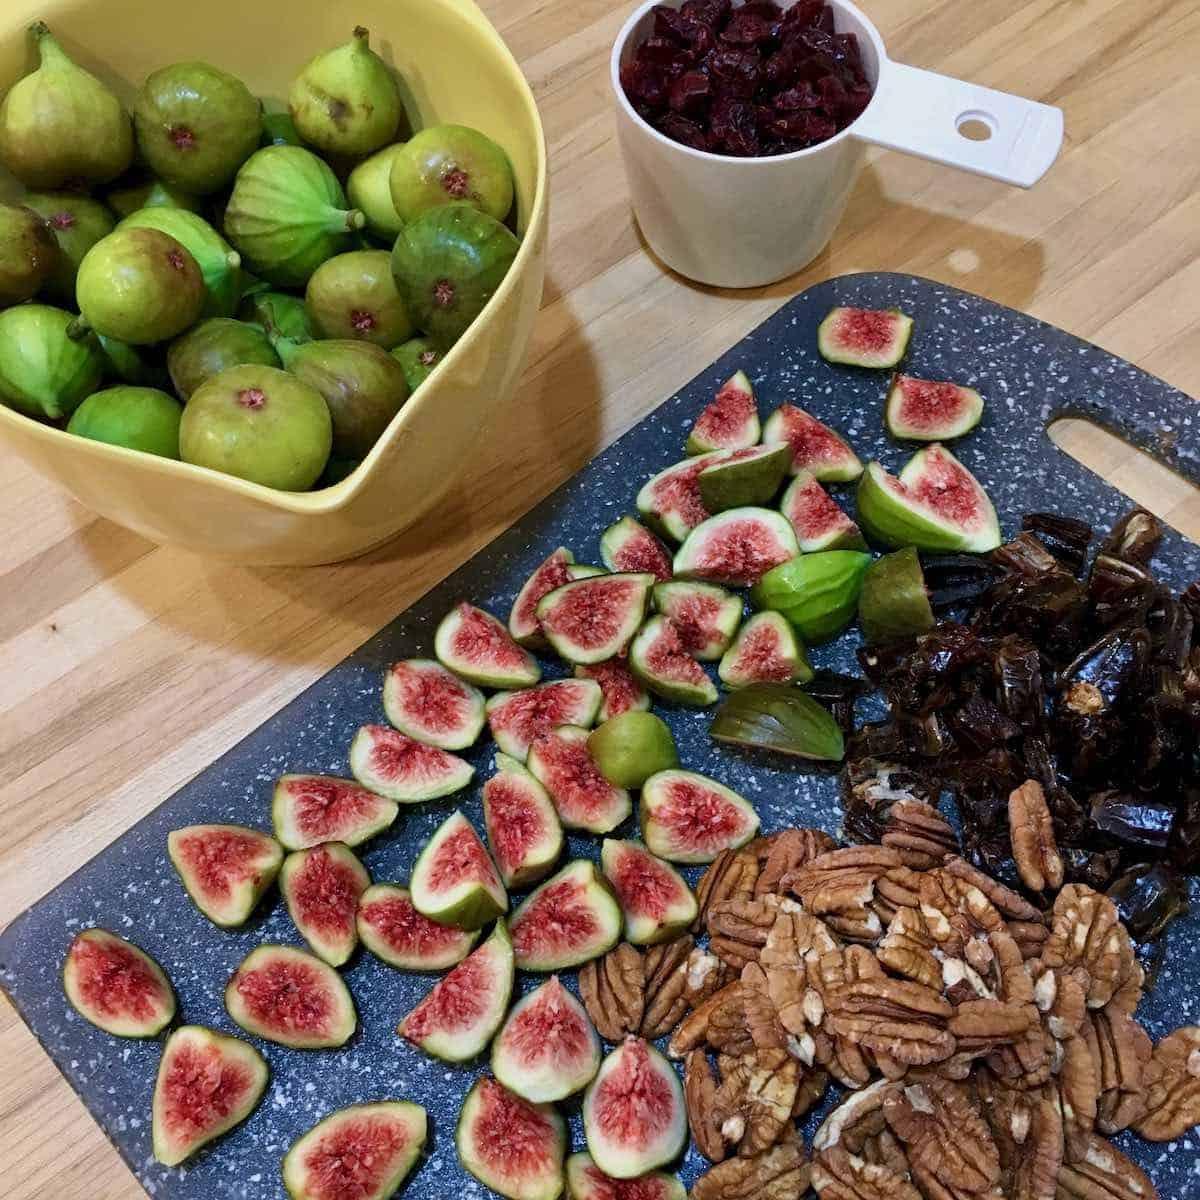 figs, dates, pecans